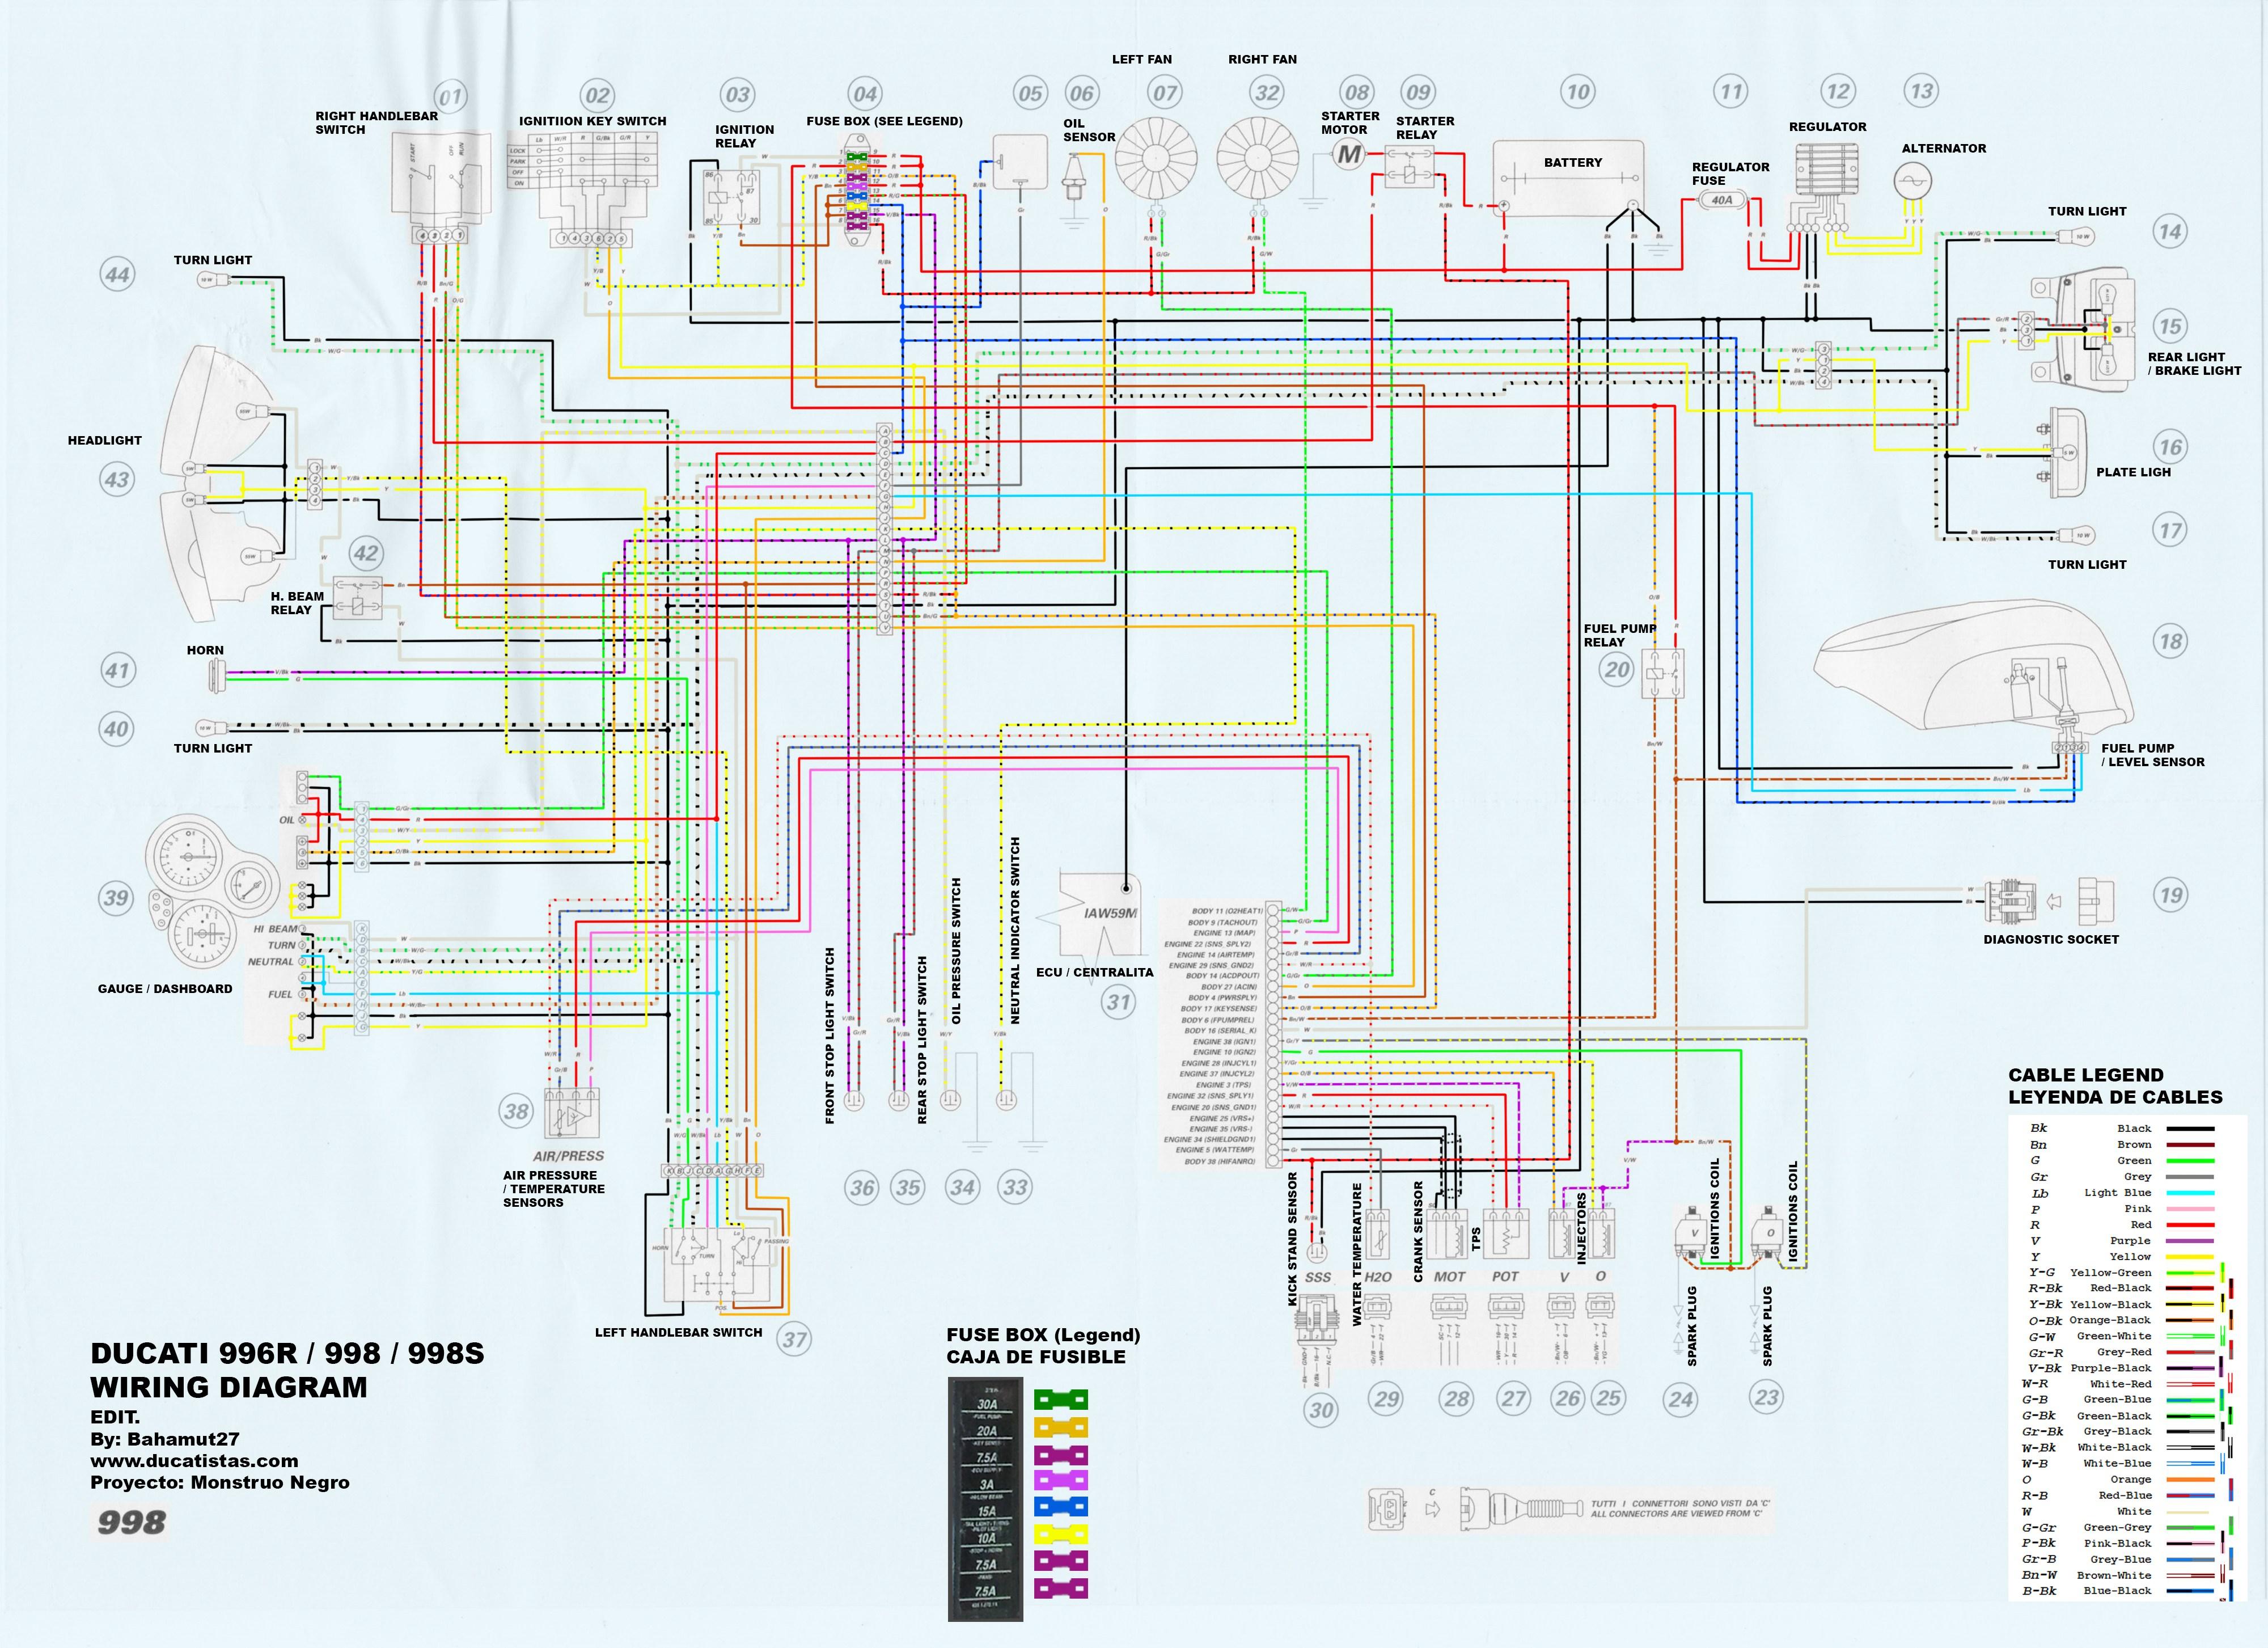 em_1952] ducati 999s wiring diagram ducati 749 wiring diagram  xempag antus rimen arcin chor orsal lite dogan gray bocep ...